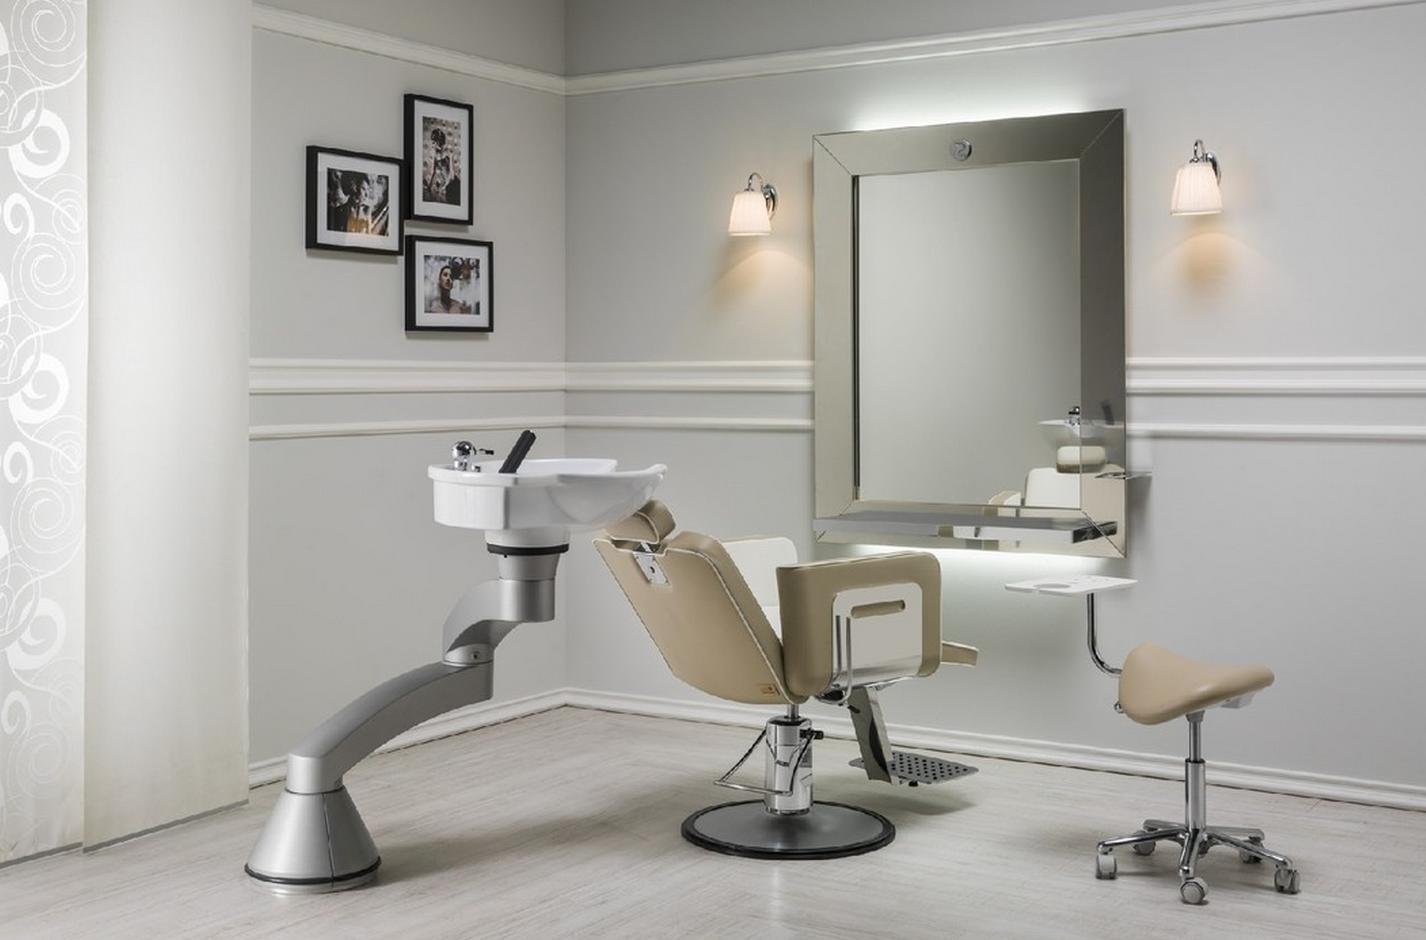 Naos design barbershop luxury elysium parrucchieri for Arredamento parrucchieri ikea